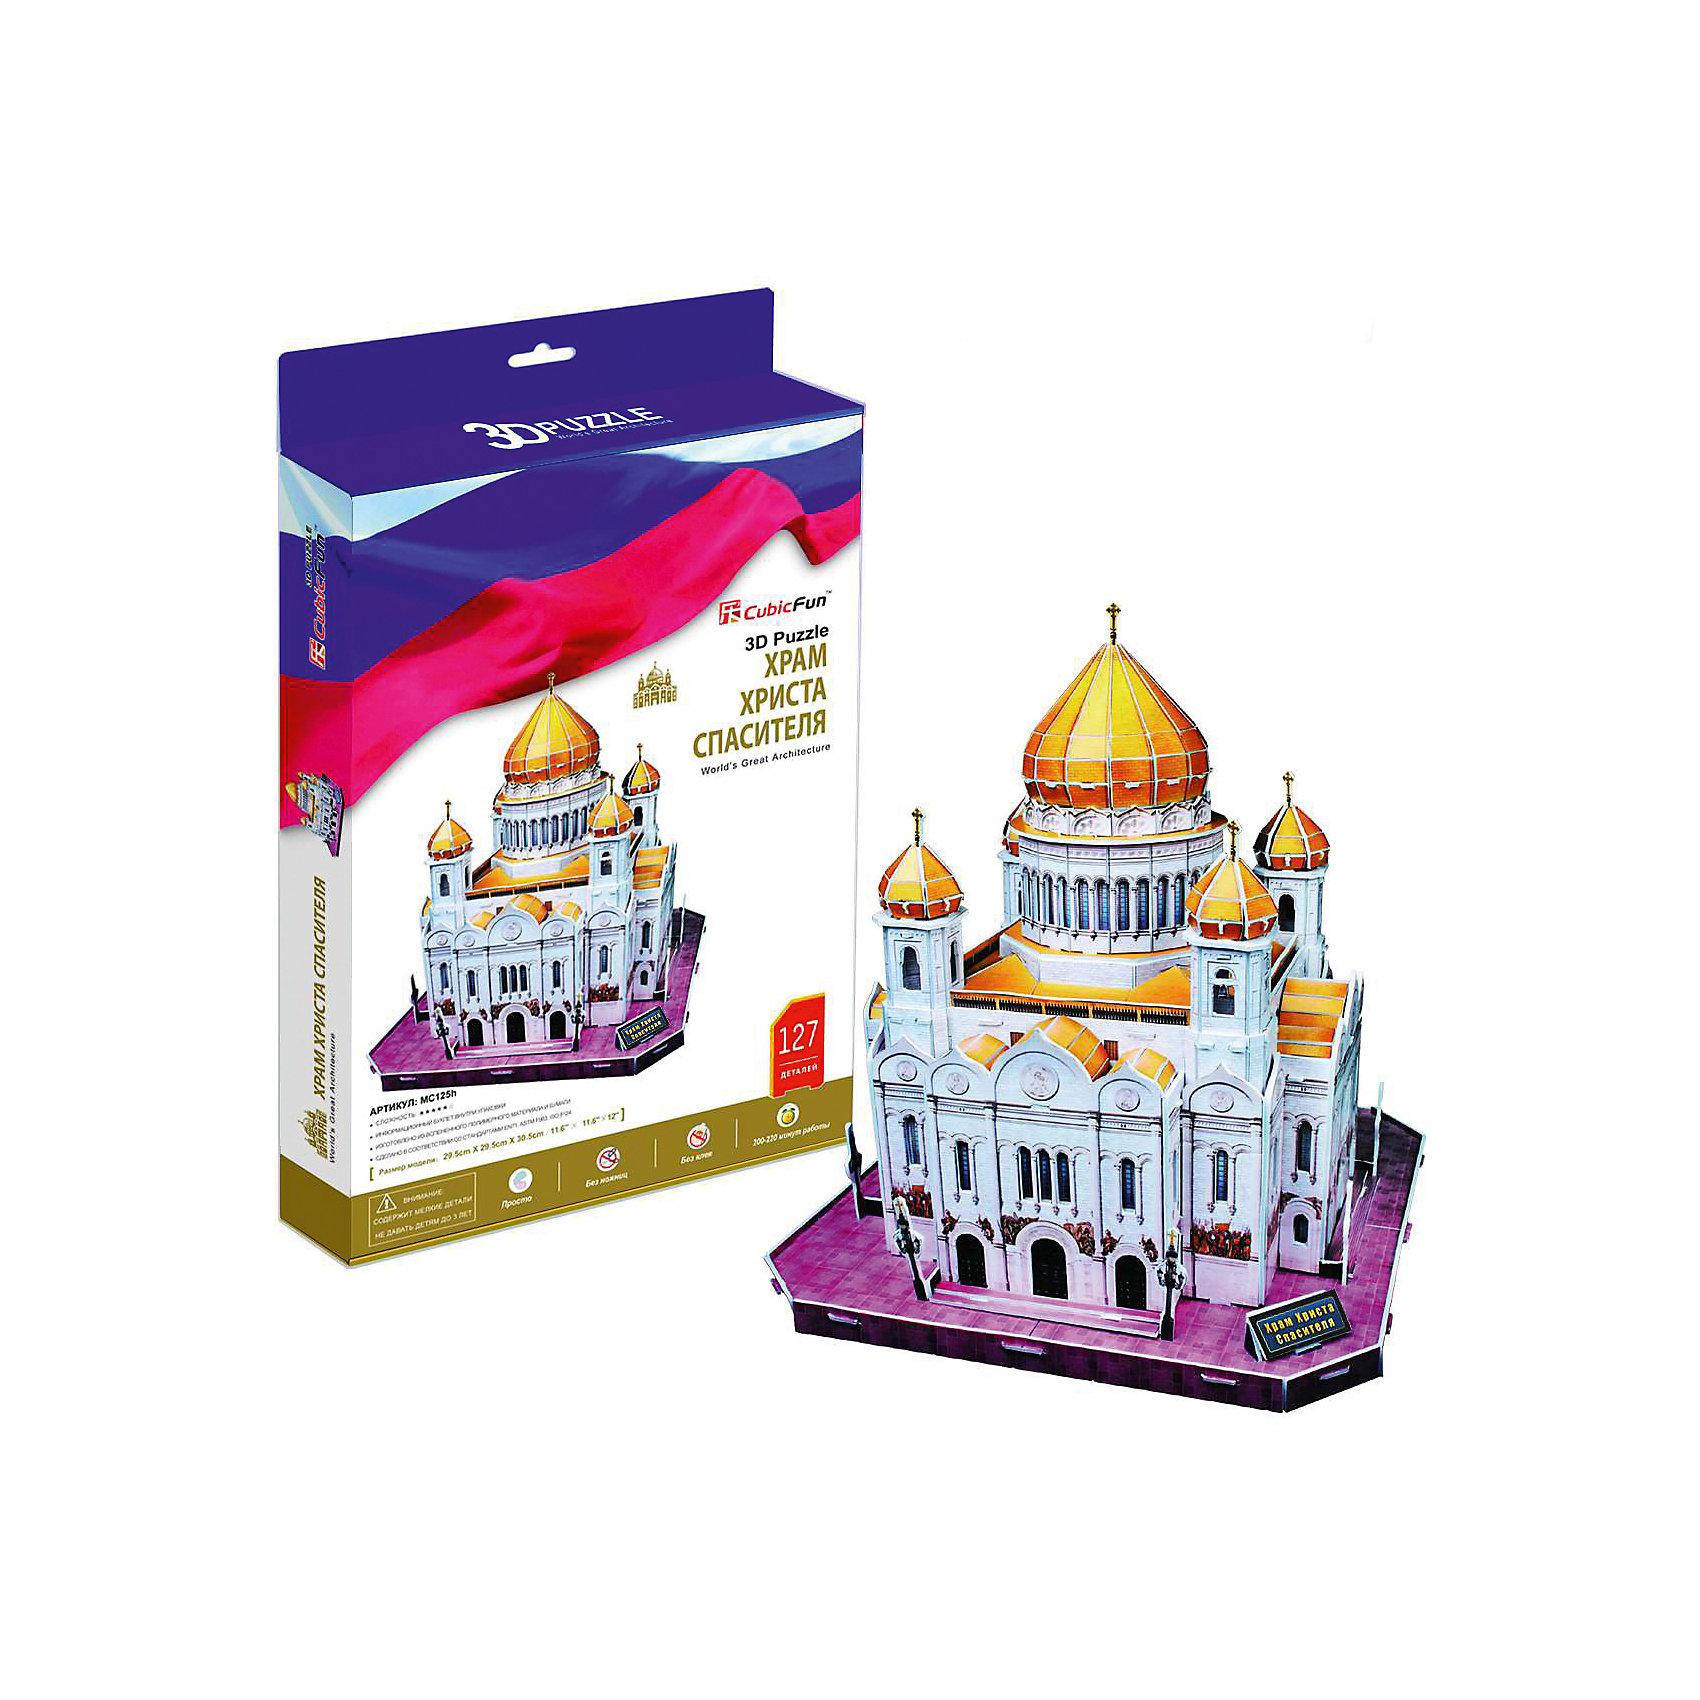 CubicFun Пазл 3D Храм Христа Спасителя, 127 деталей, CubicFun конструкторы cubicfun 3d пазл эйфелева башня 2 франция